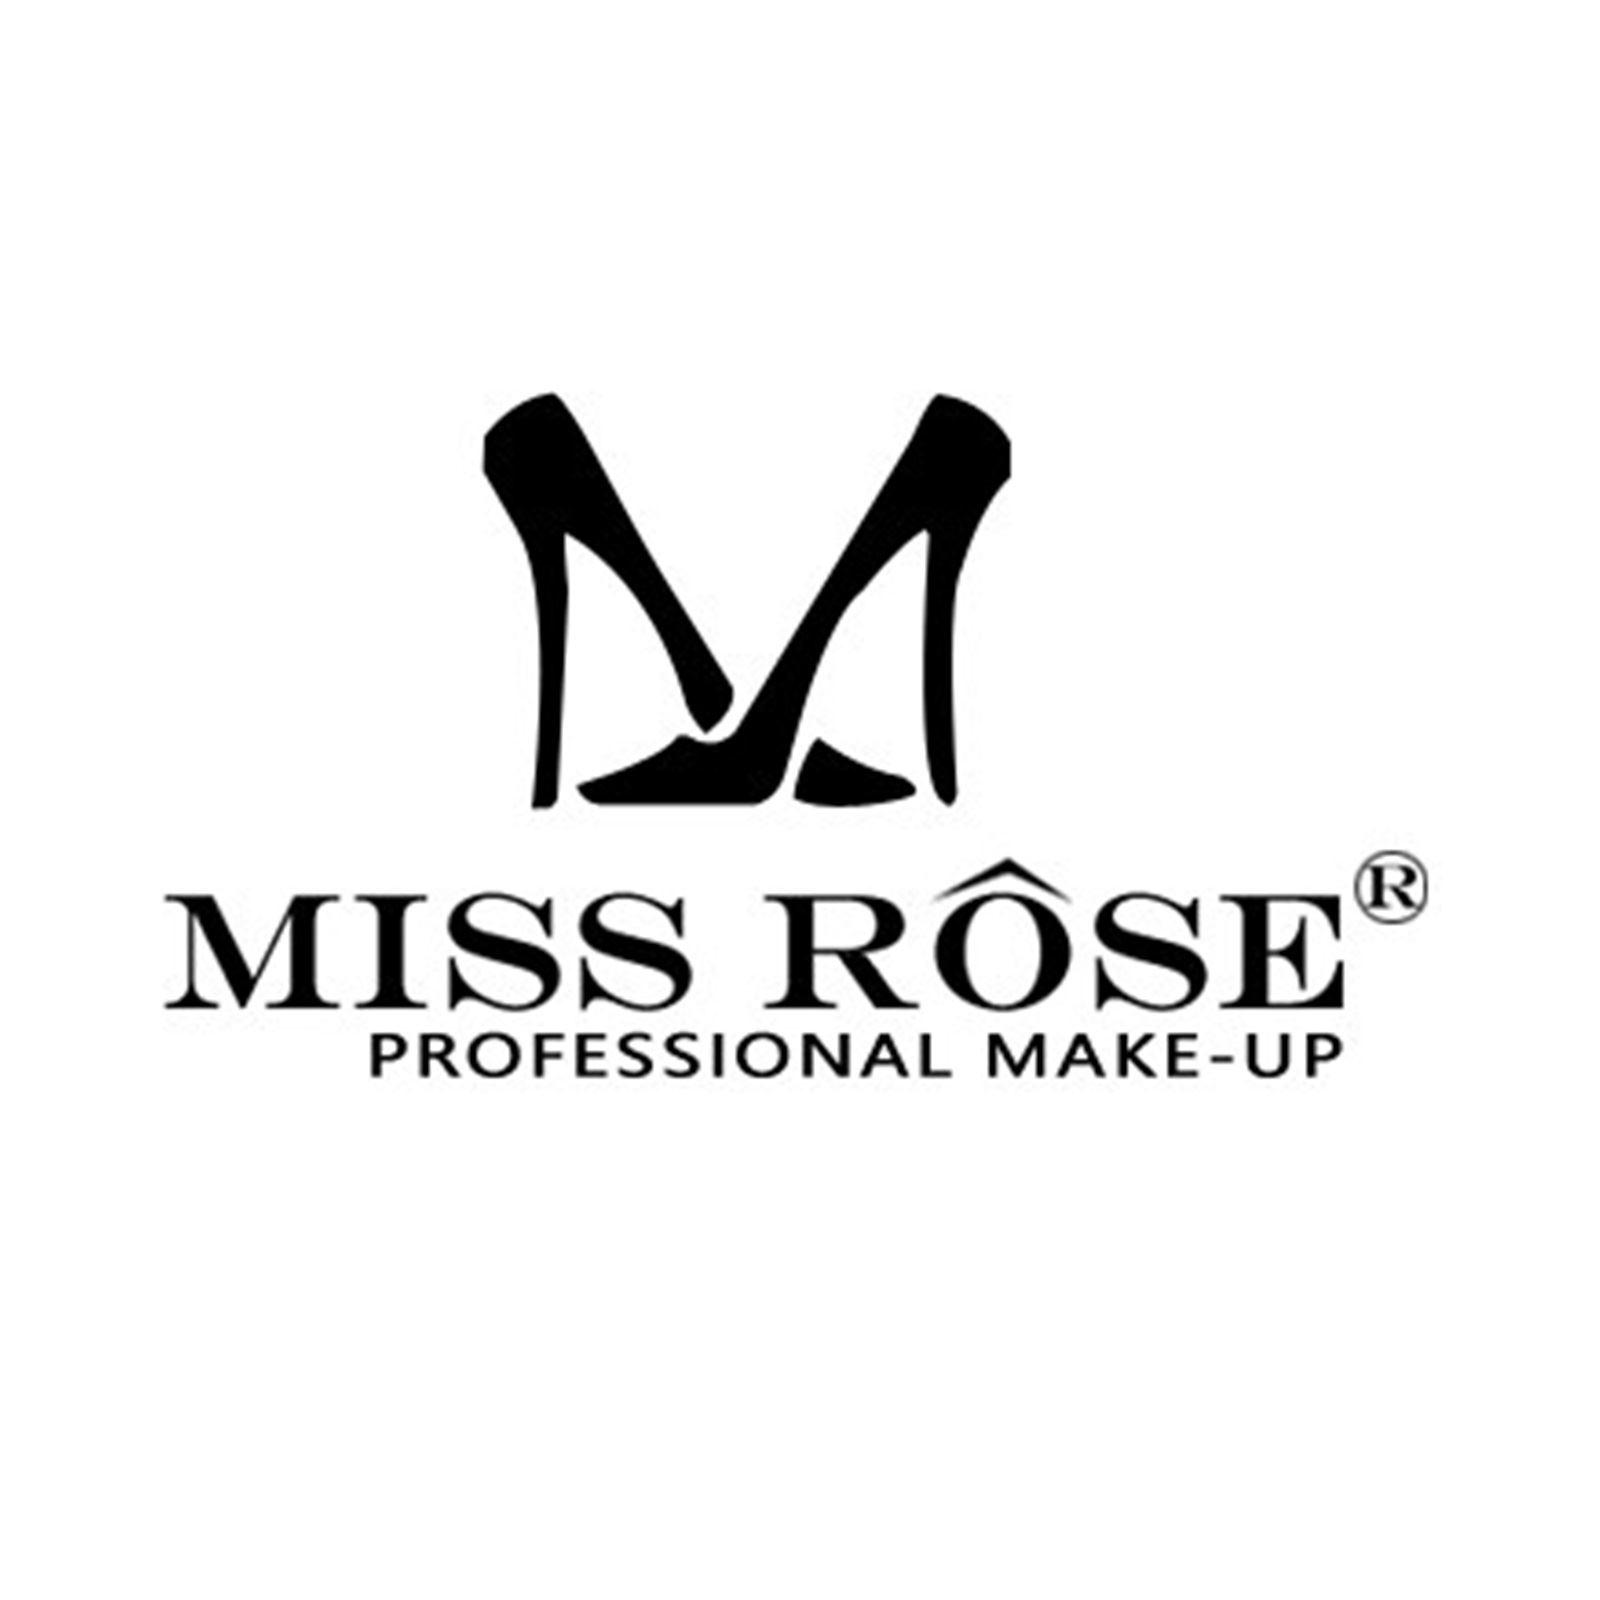 Miss Rose Makeup Vanity Case Cosmetic Set Make Up Storage Carry Box Gift Kit New Ebay